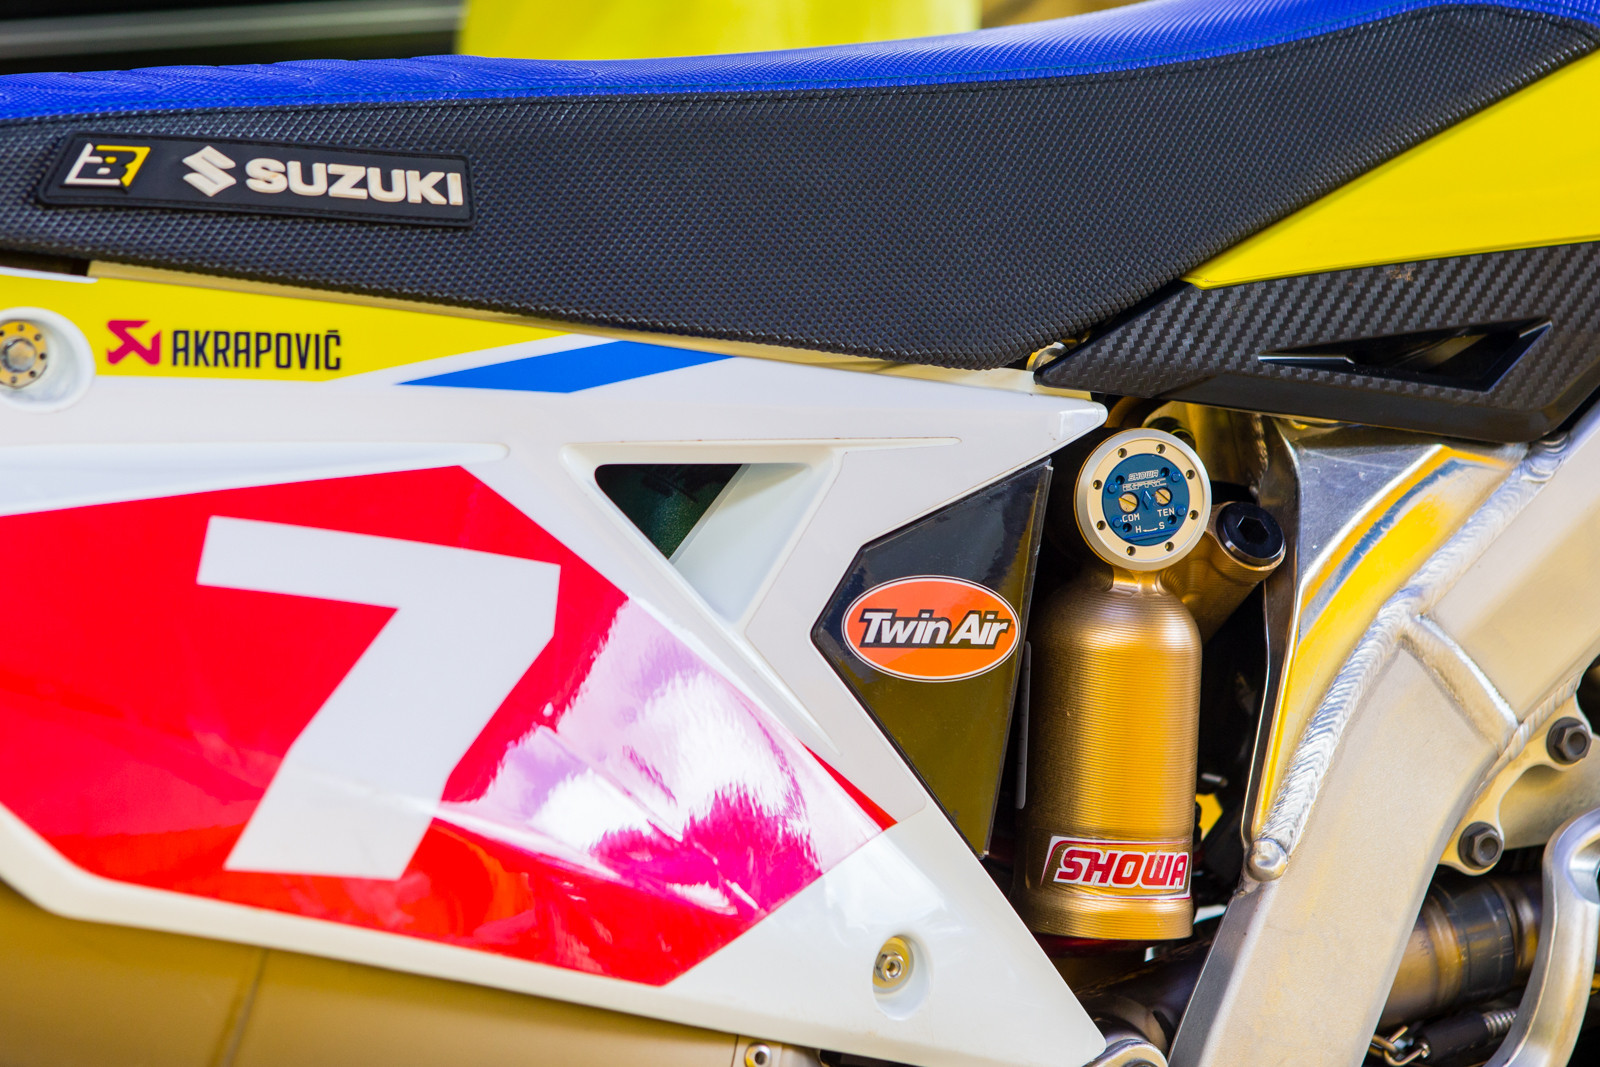 2018 Suzuki RM-Z450WS - Showa BFRC (Balance Free Rear-Cushion) - Vital MX Pit Bits: 2017 Sugo All-Japan National - Motocross Pictures - Vital MX